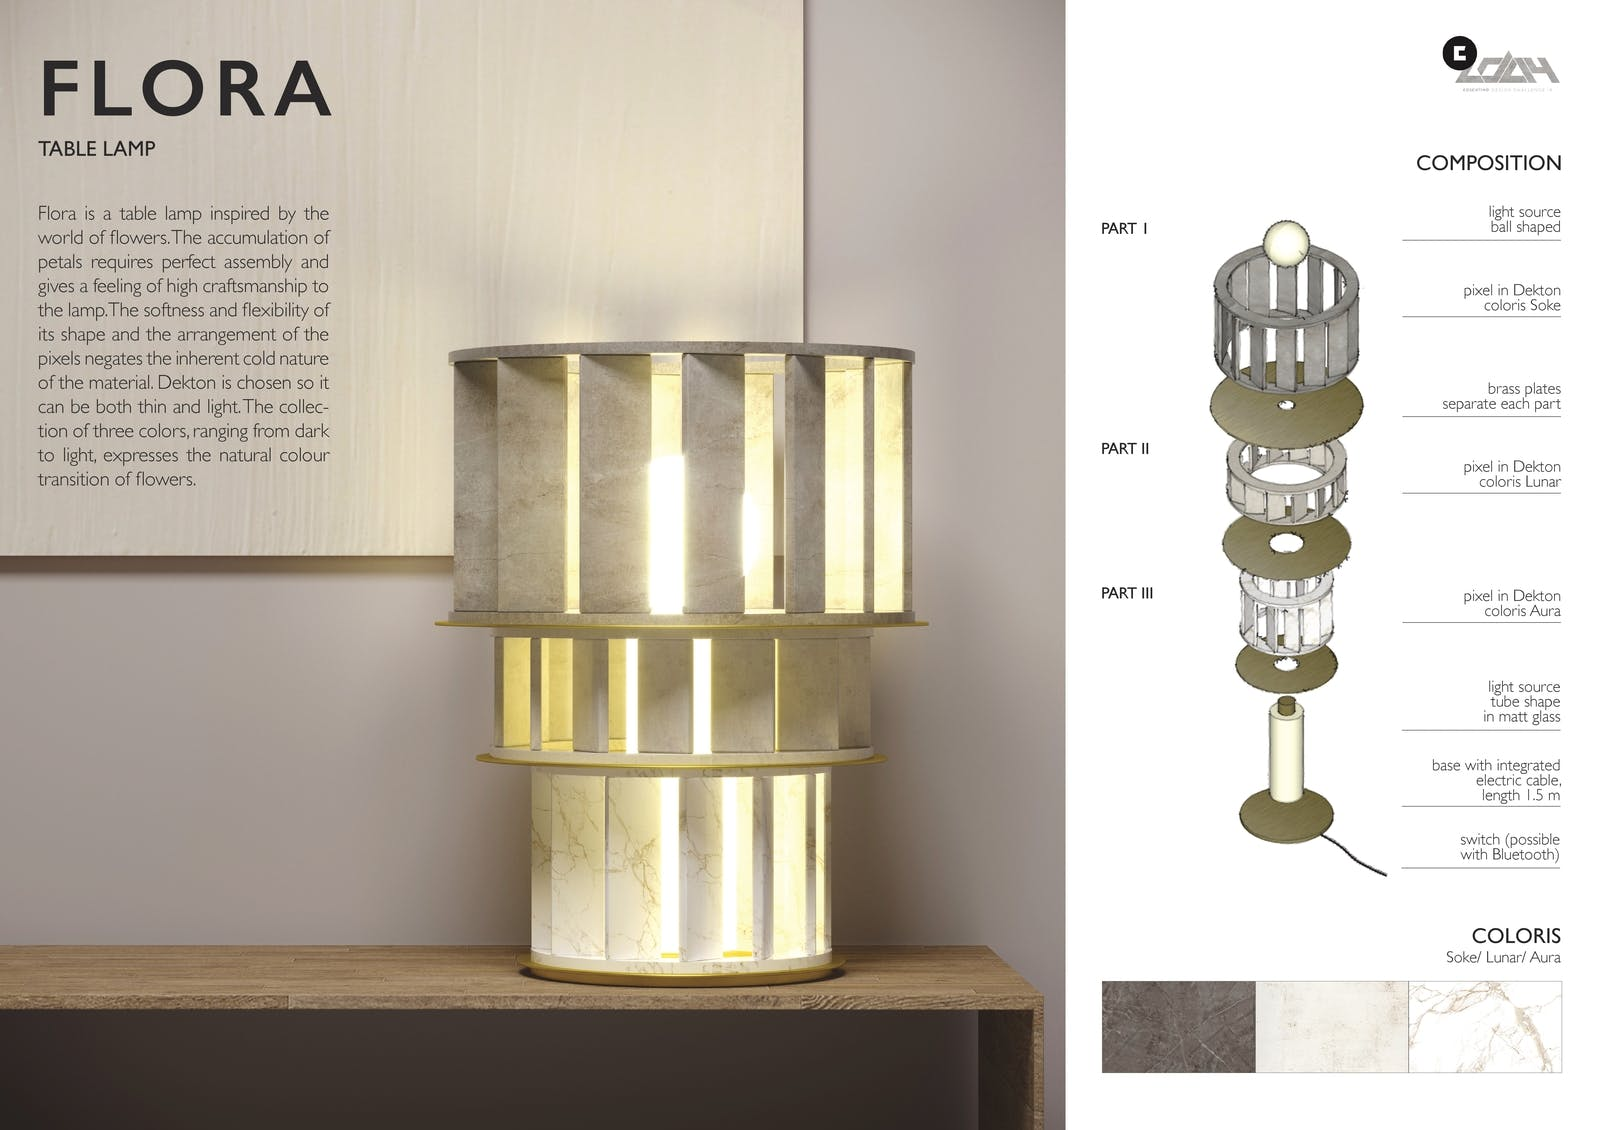 Image of 071 FLORA s in Cosentino Design Challenge 14 winners - Cosentino